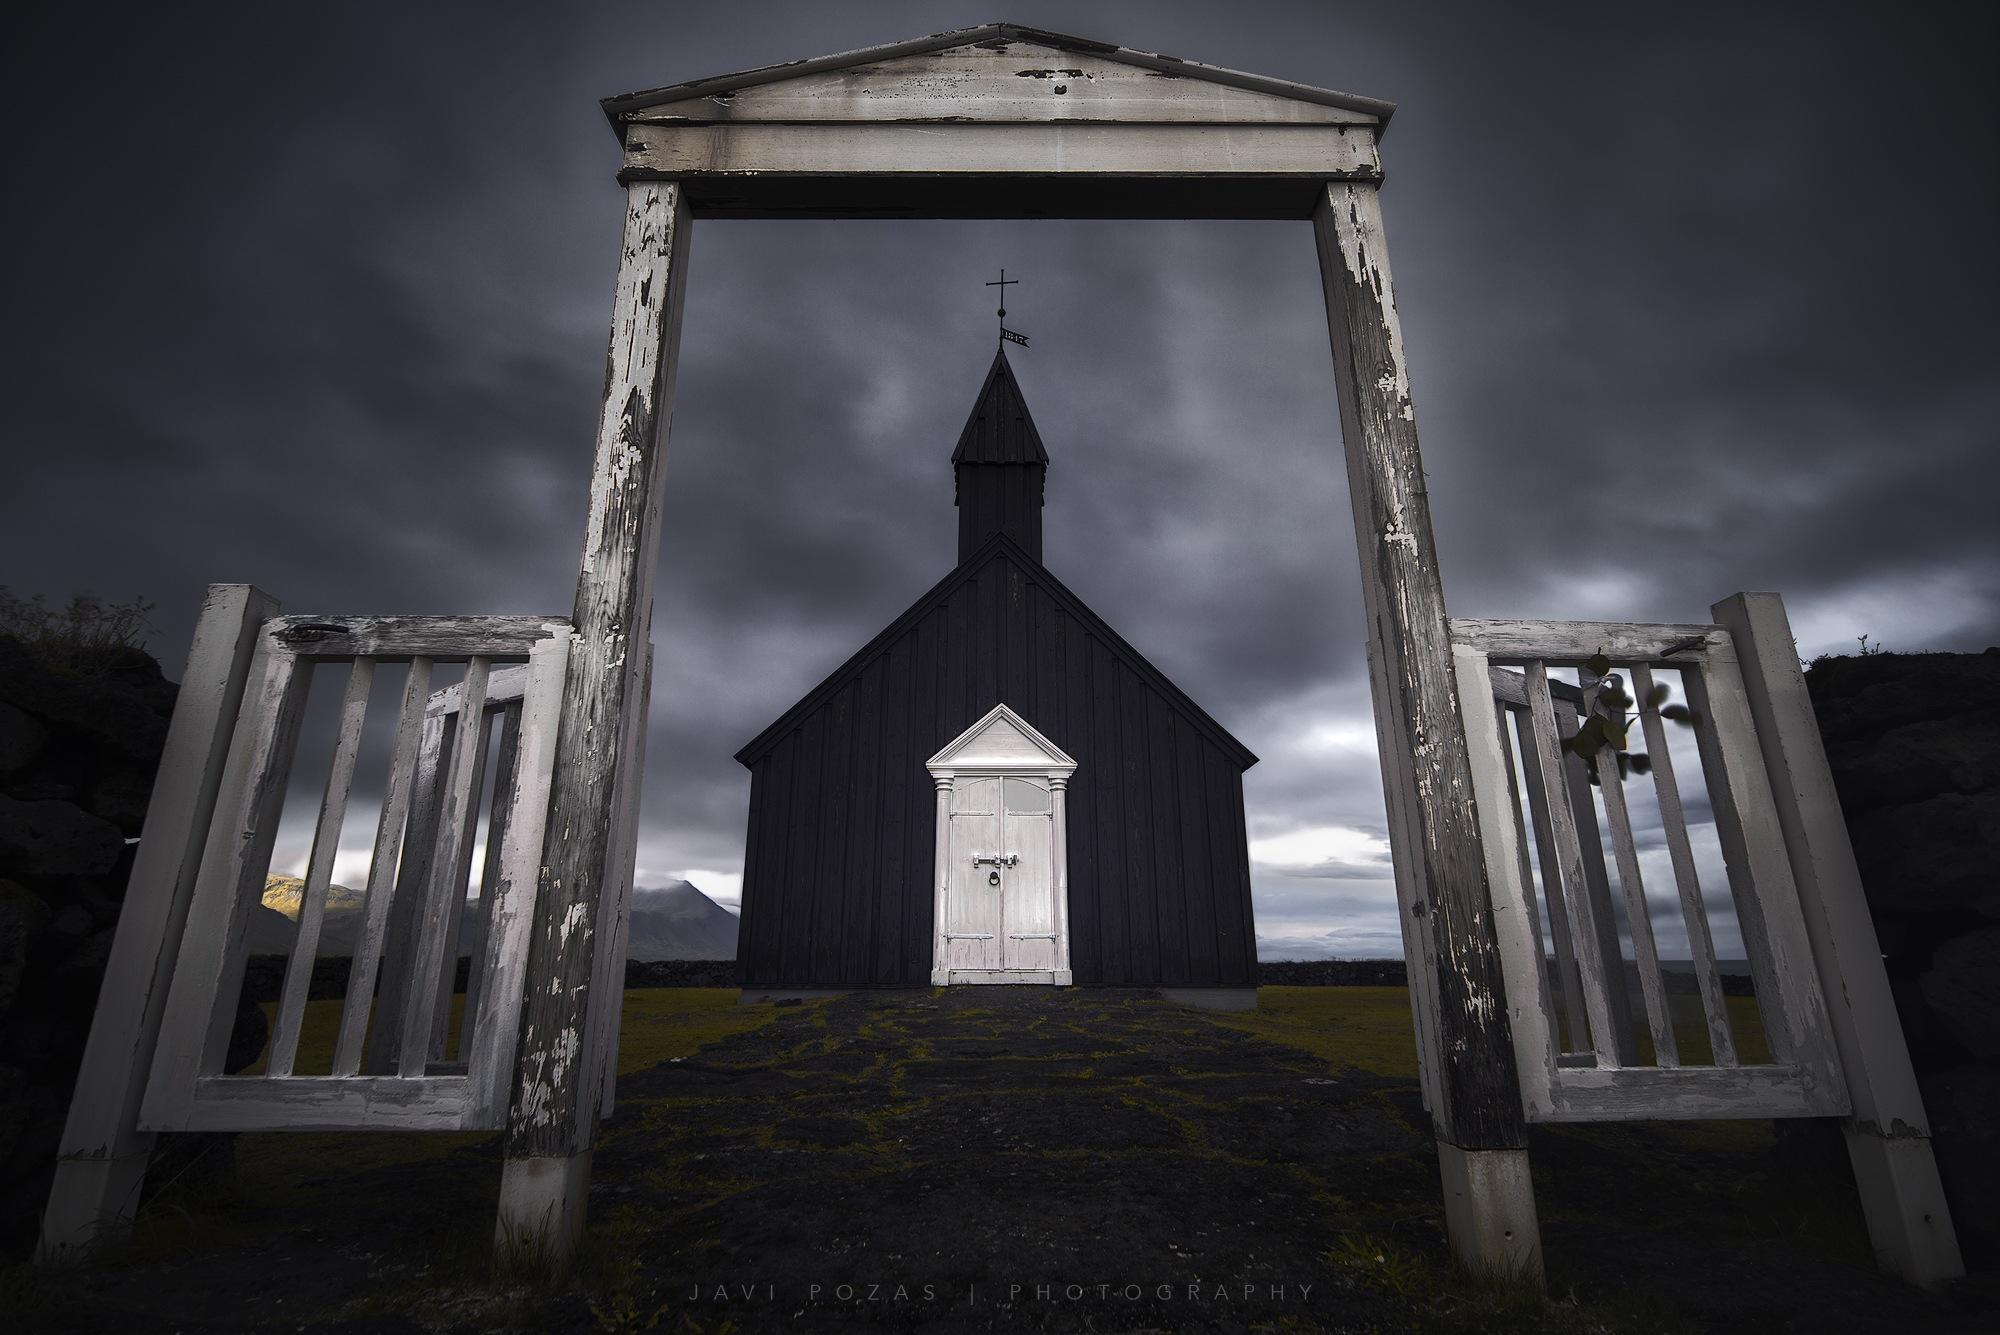 Buðir black church by Javi Pozas